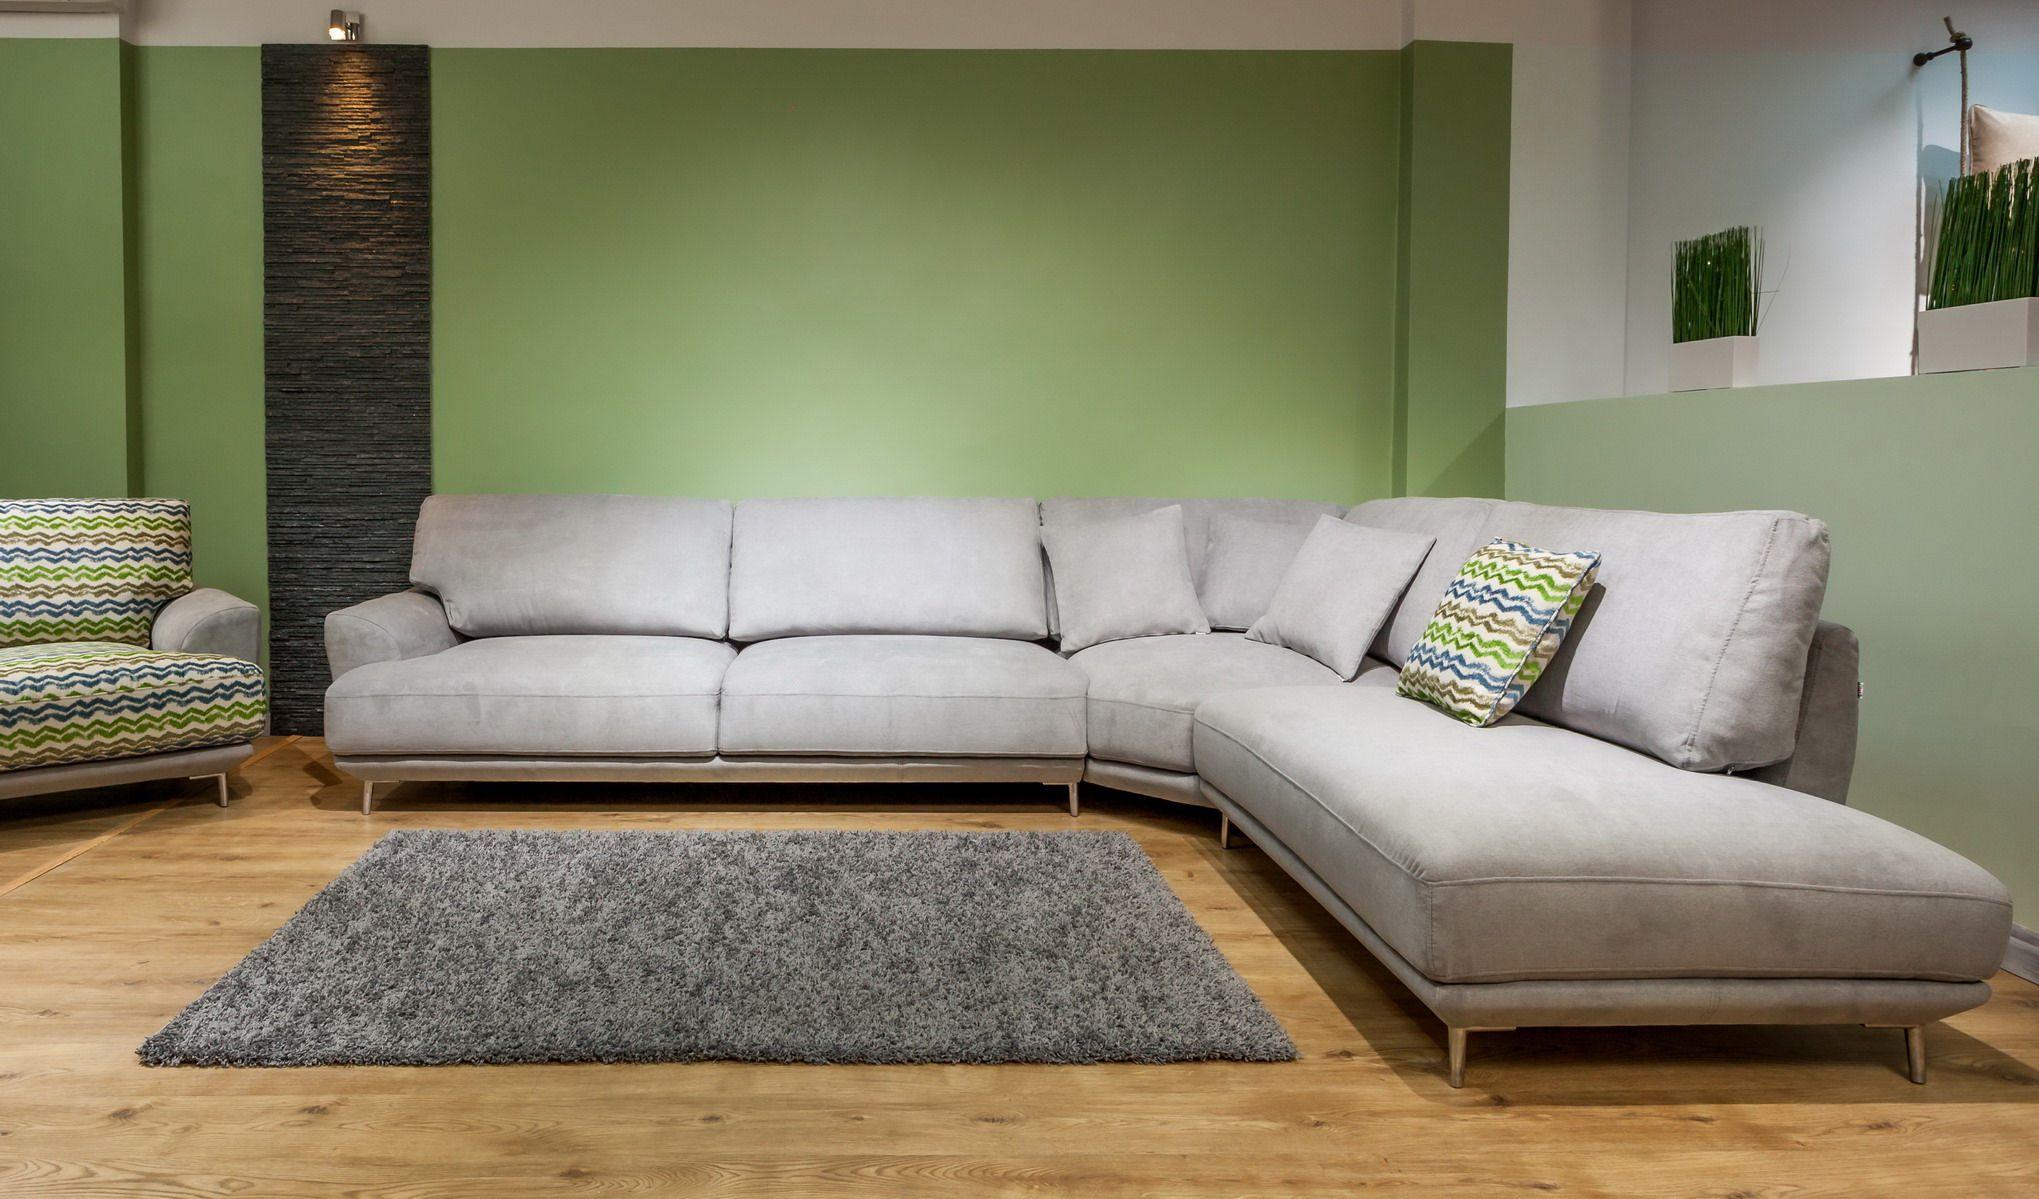 Coltar Rosario Home Living room Pinterest